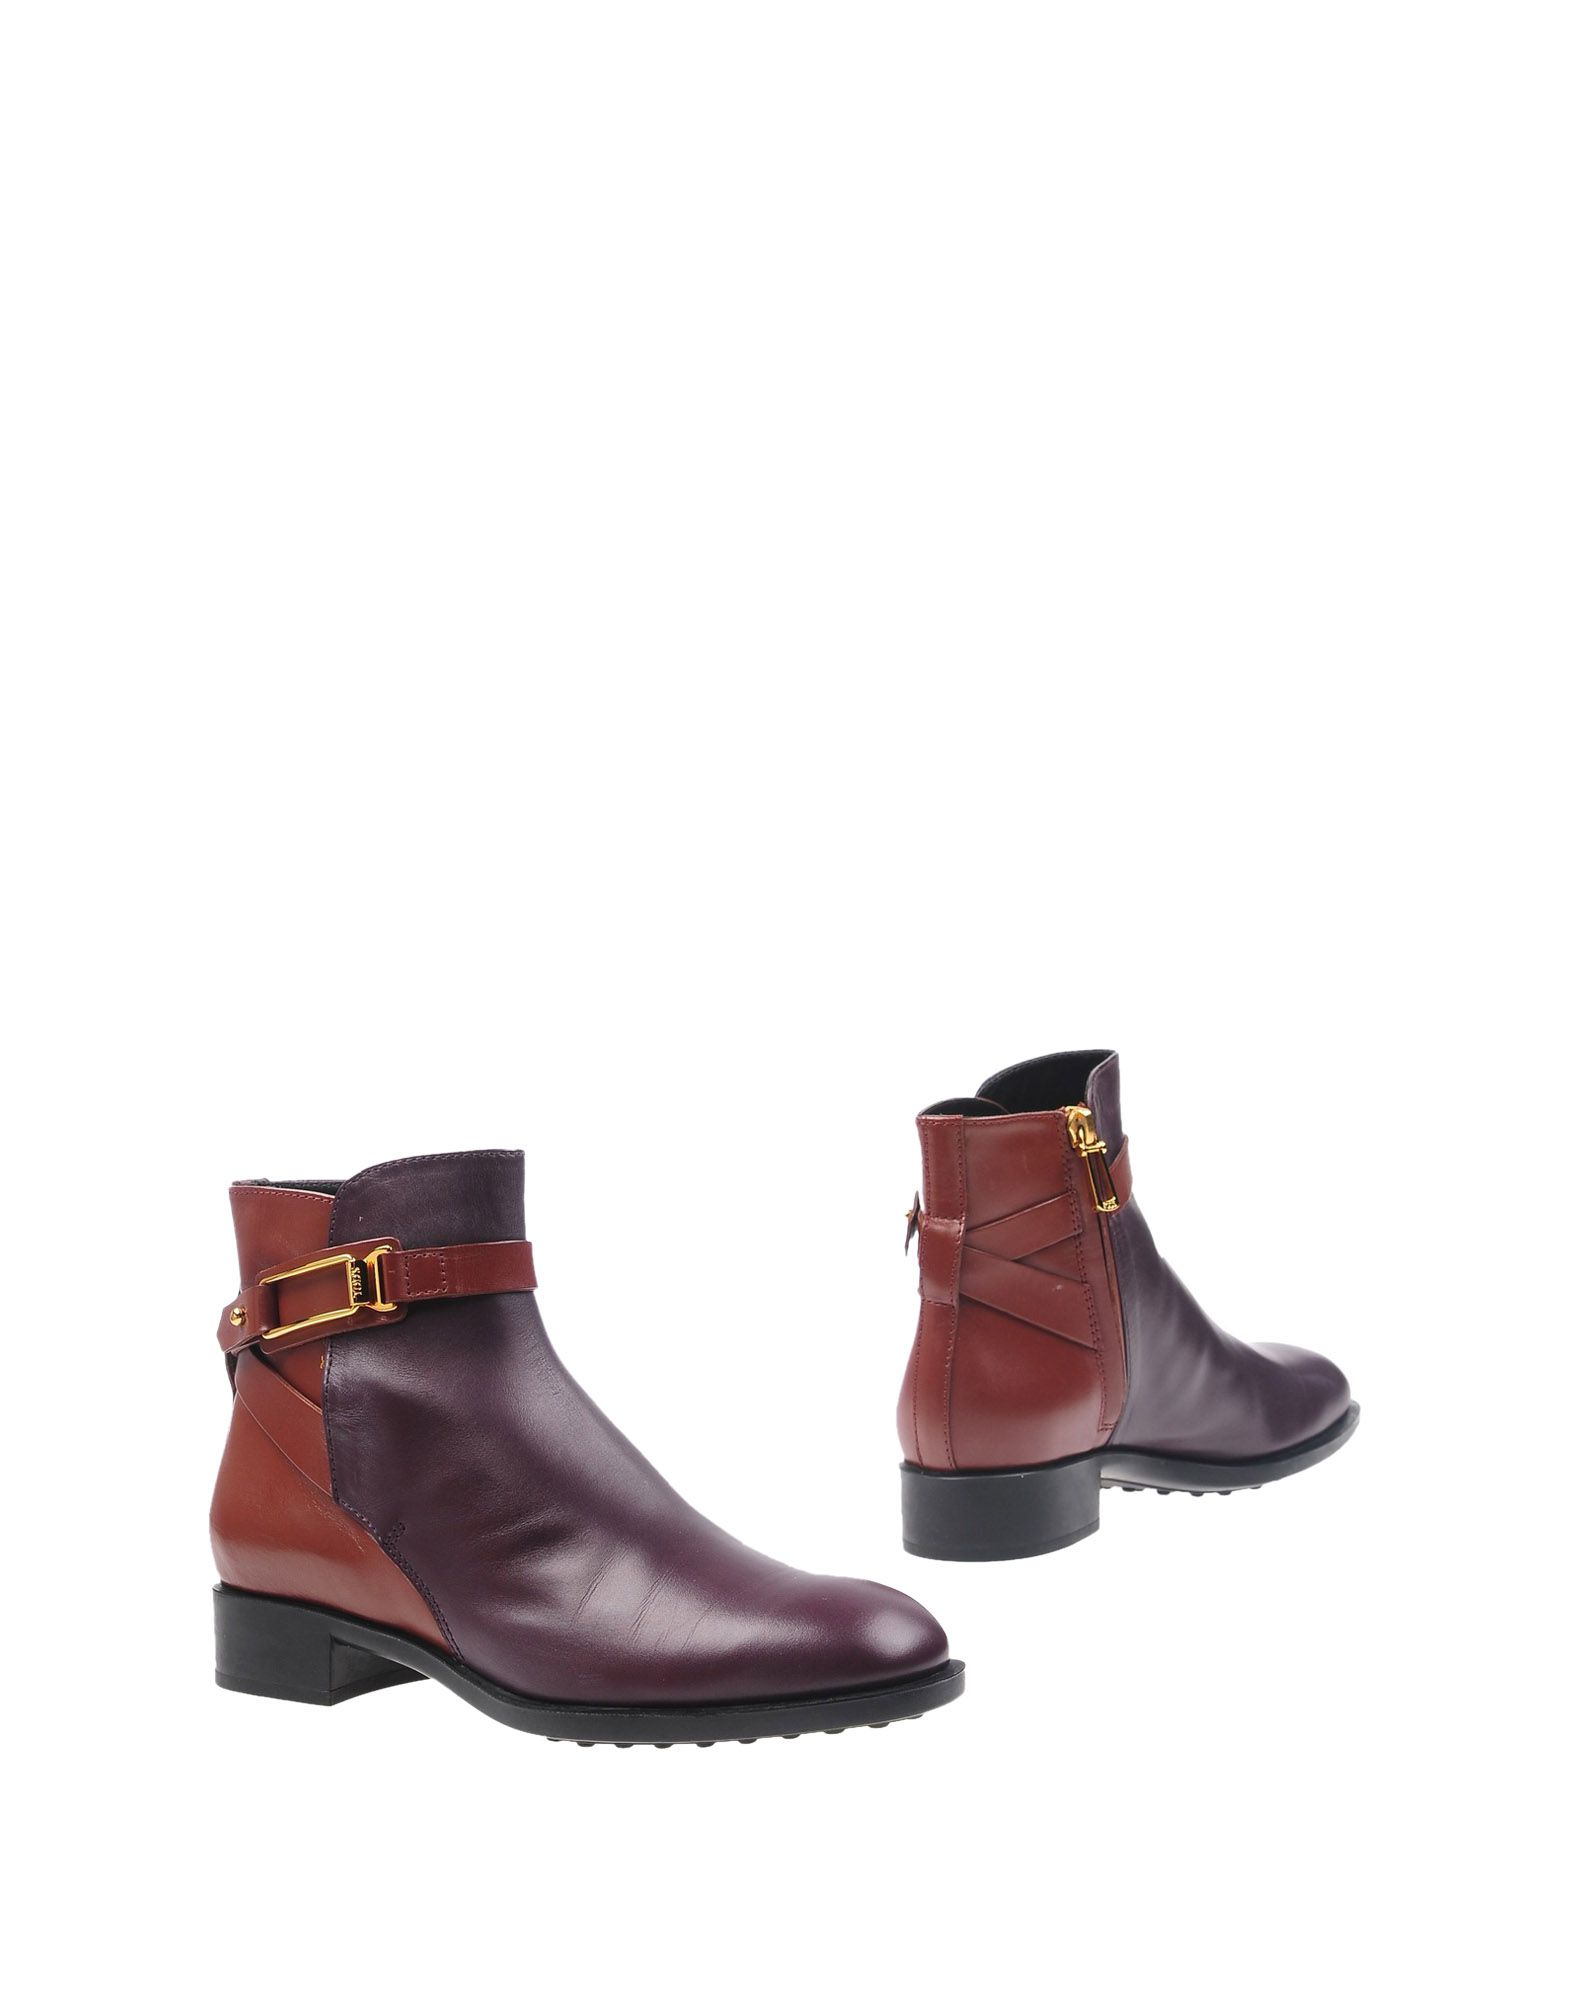 Rabatt Schuhe Tod's Stiefelette Damen  11242761GR